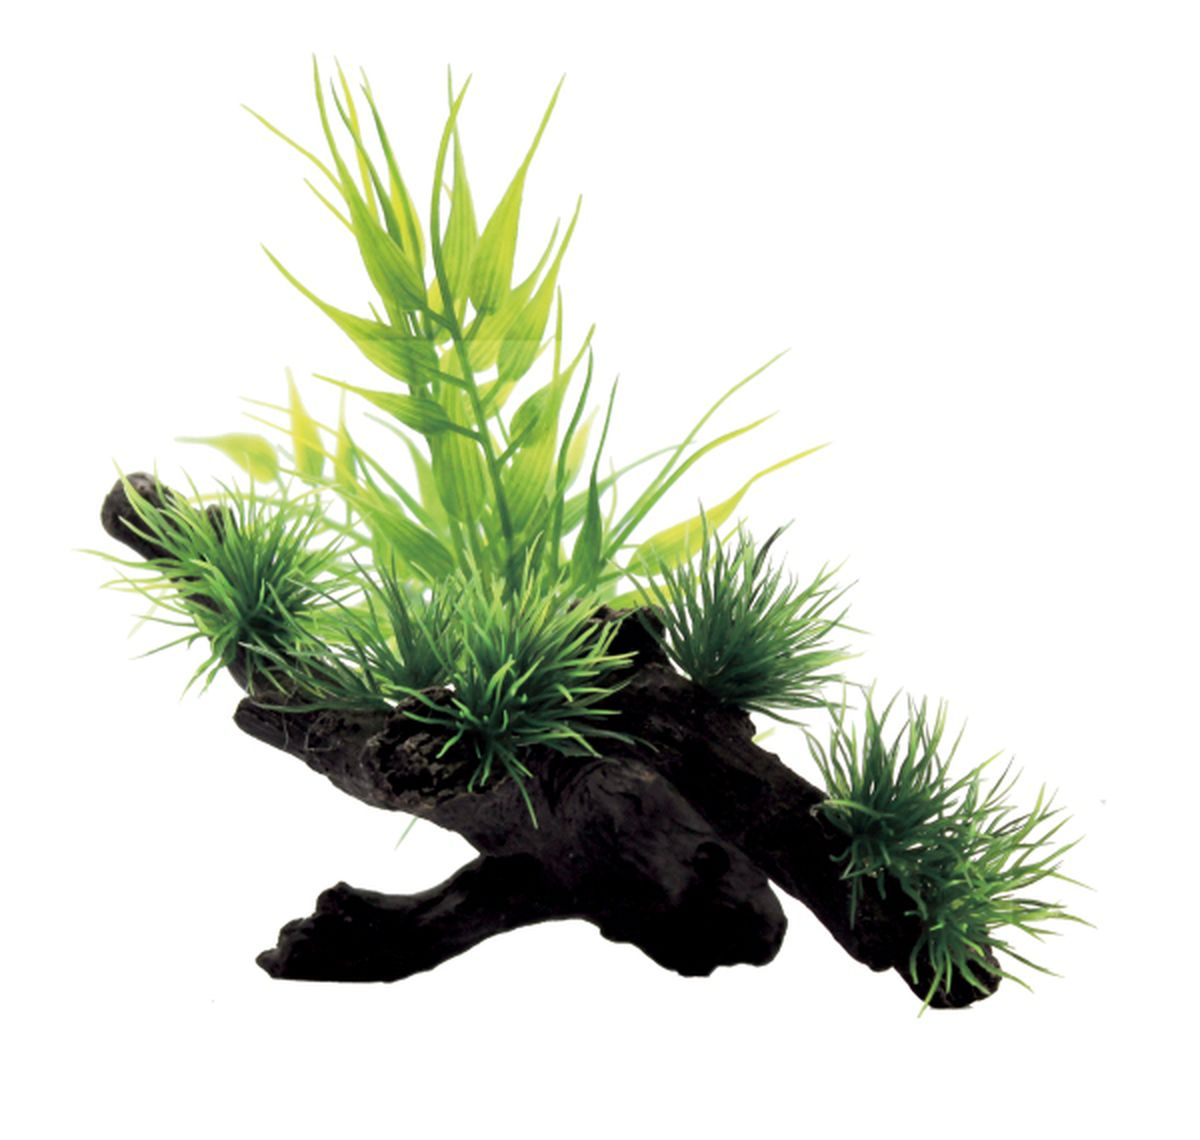 Композиция из растений для аквариума ArtUniq Бамбук на коряге, 15 x 12 x 12 см